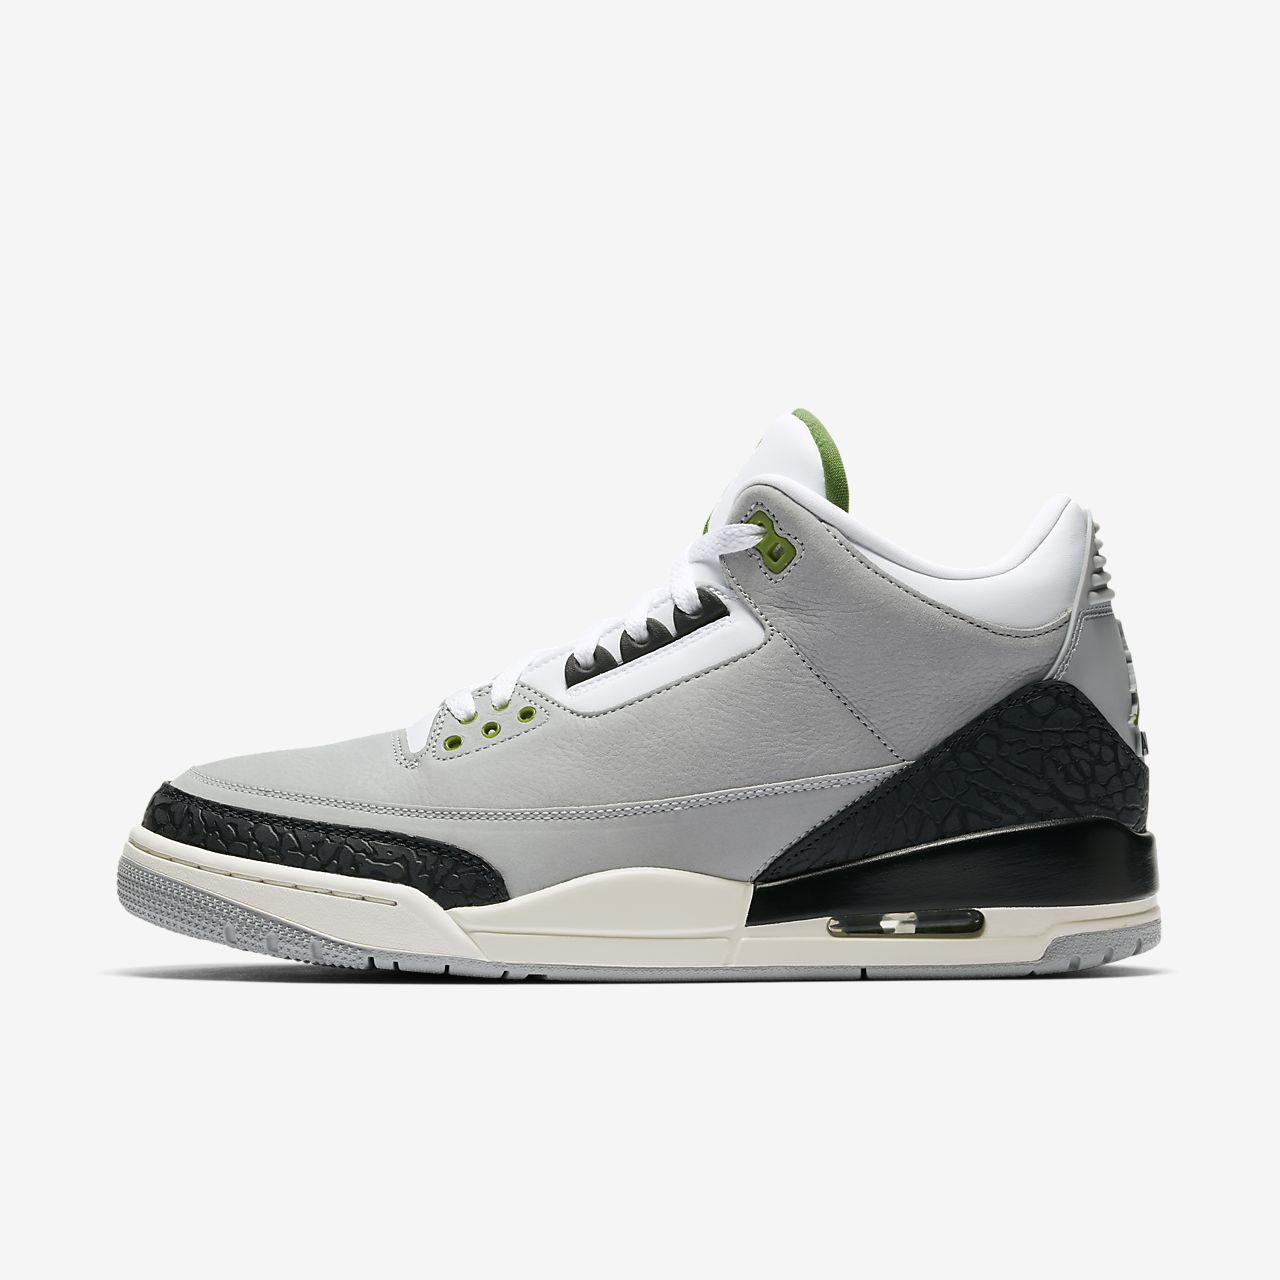 sports shoes 1aa4d 27faa ... Chaussure Air Jordan 3 Retro pour Homme